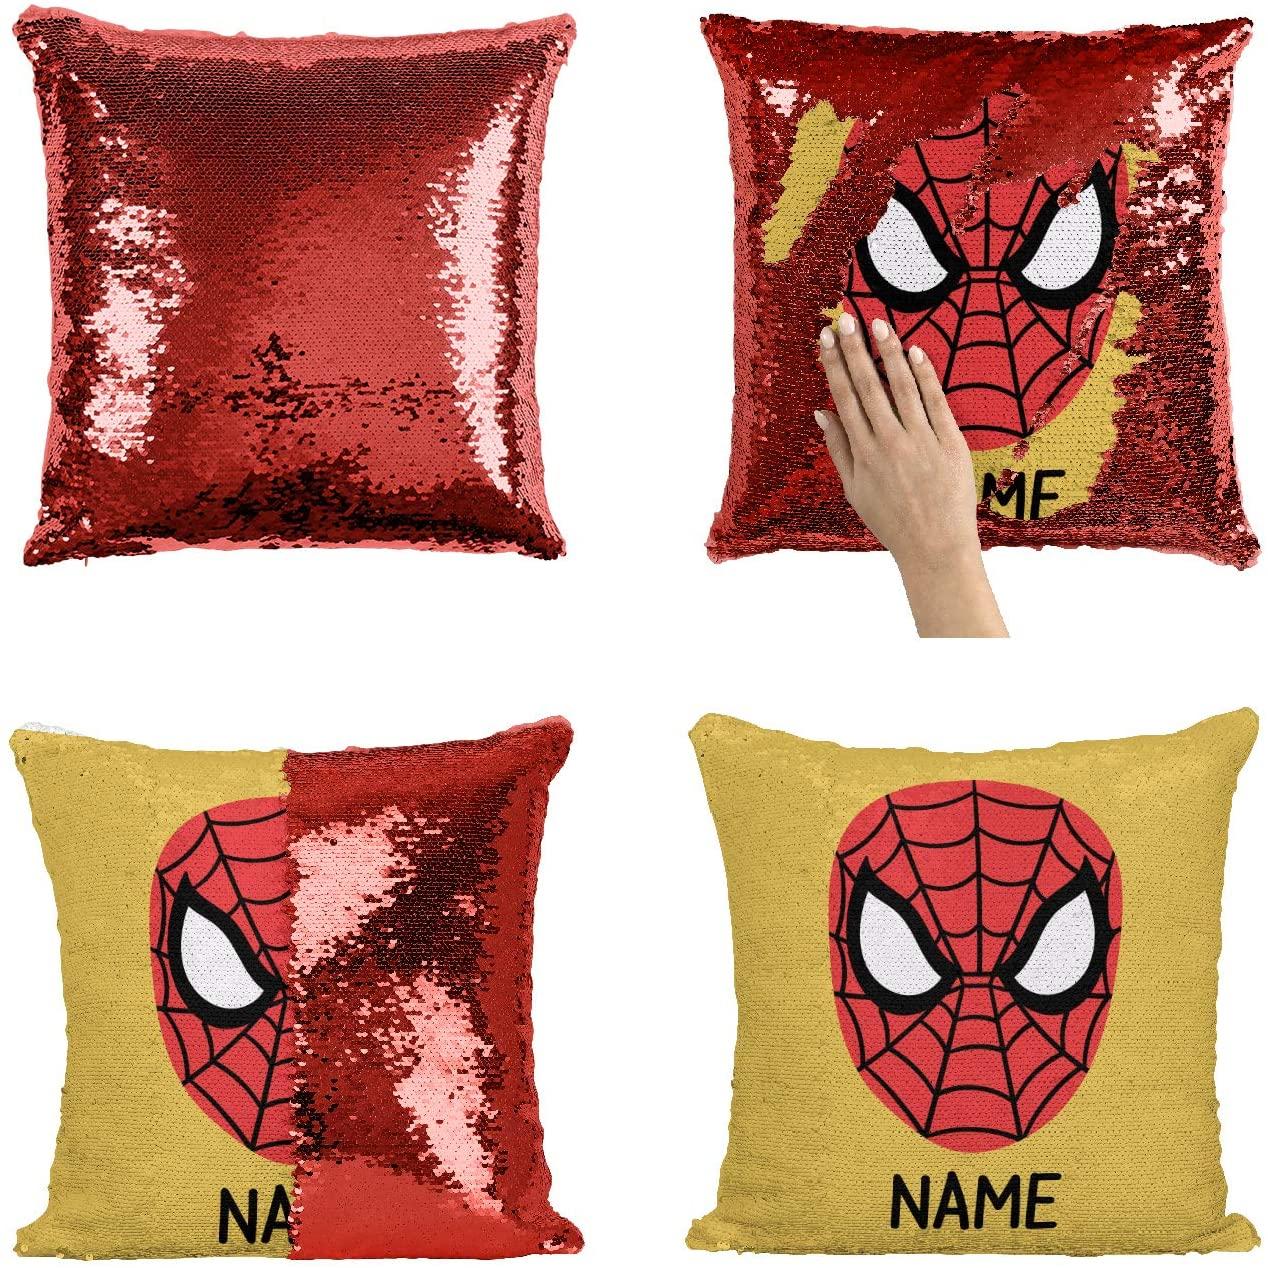 Custom Name Superhero Boy Sequin Pillow, Superhero Personalized Sequin Pillowcase Add Your Text Name Custom Pillow with Boy Name, Personalized Mermaid Pillow Superhero_2_P407